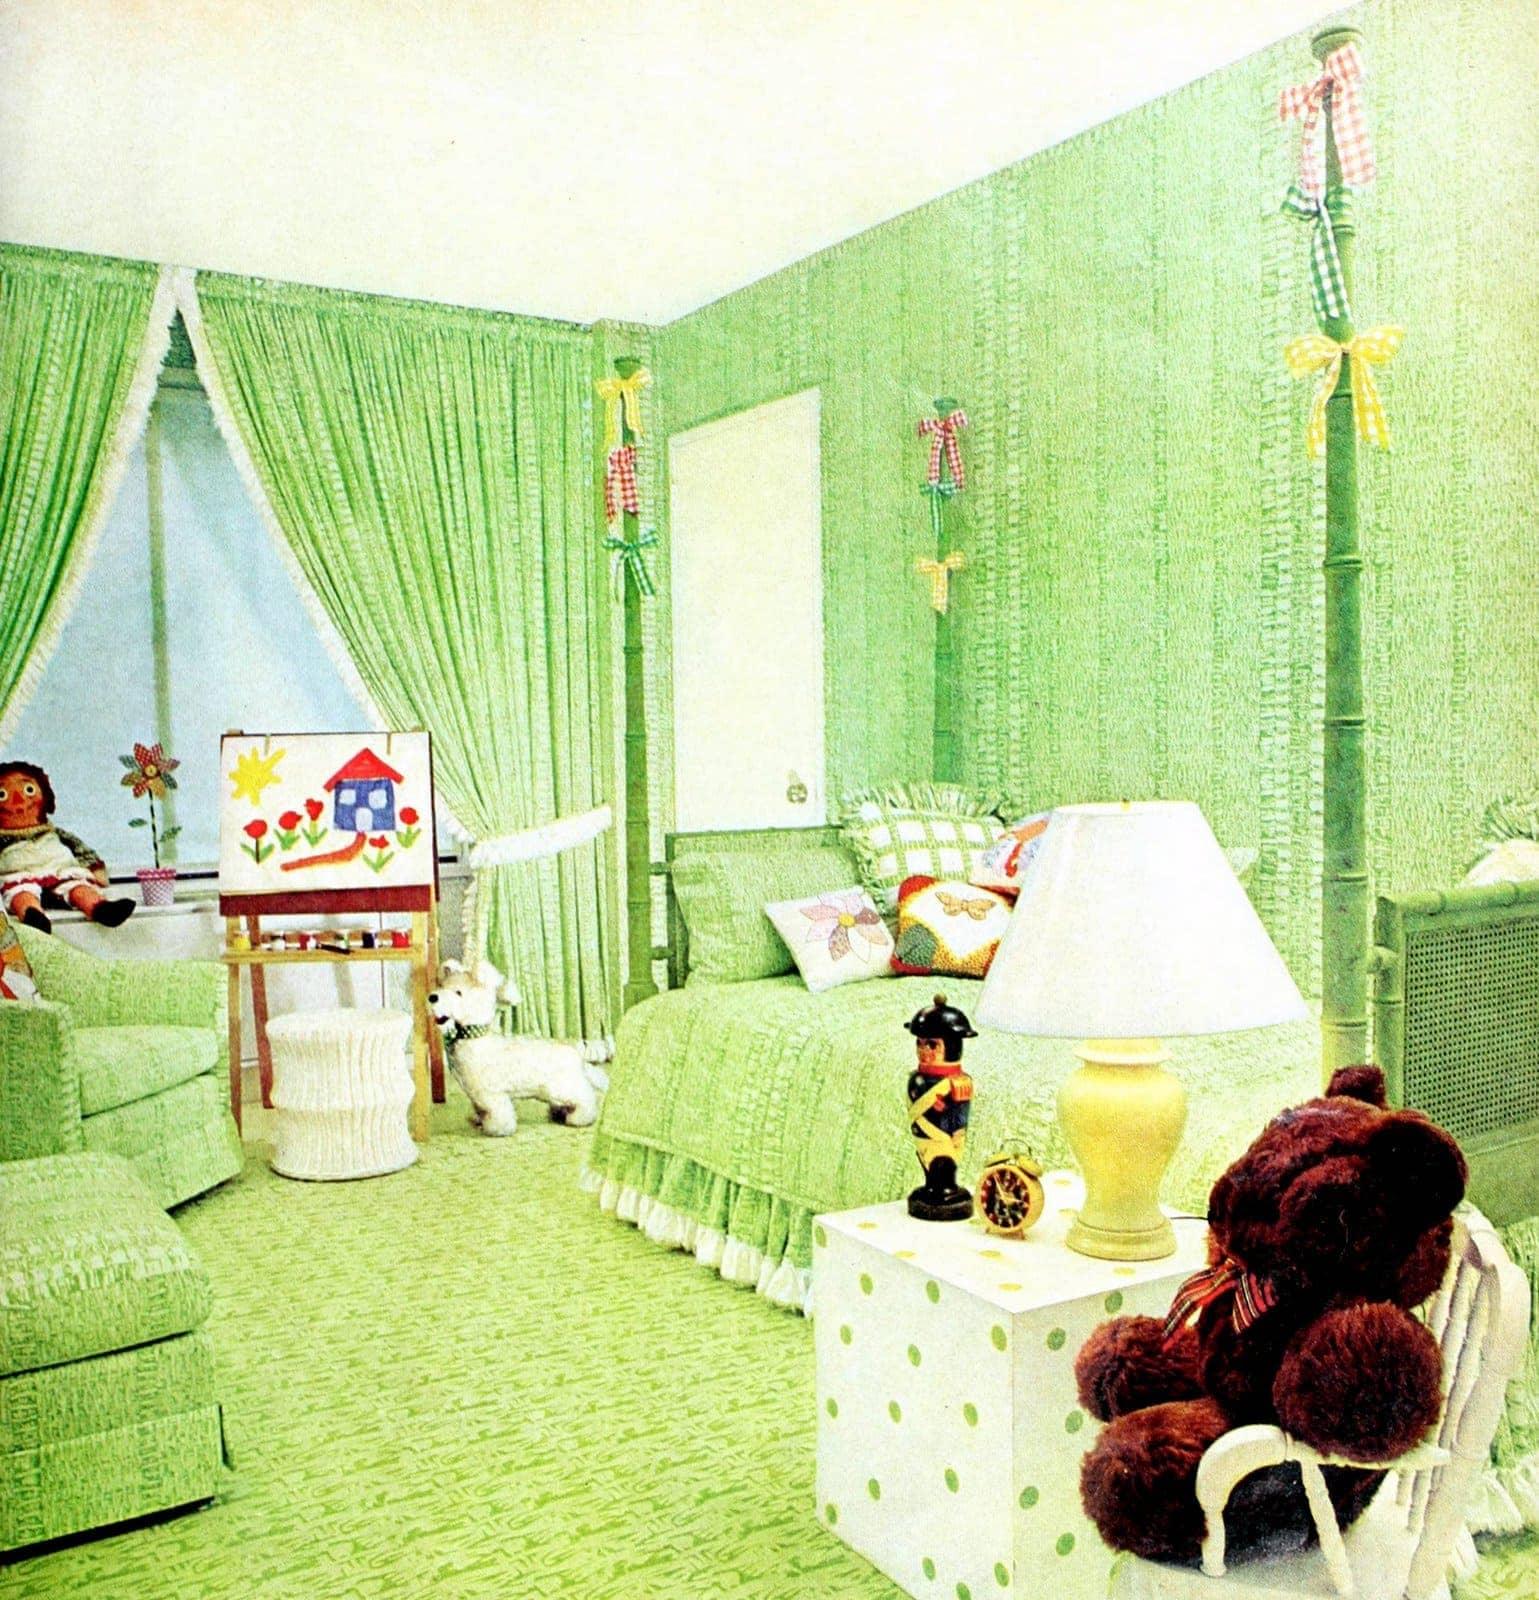 Vintage green bedding - child's bedroom decor (1974)